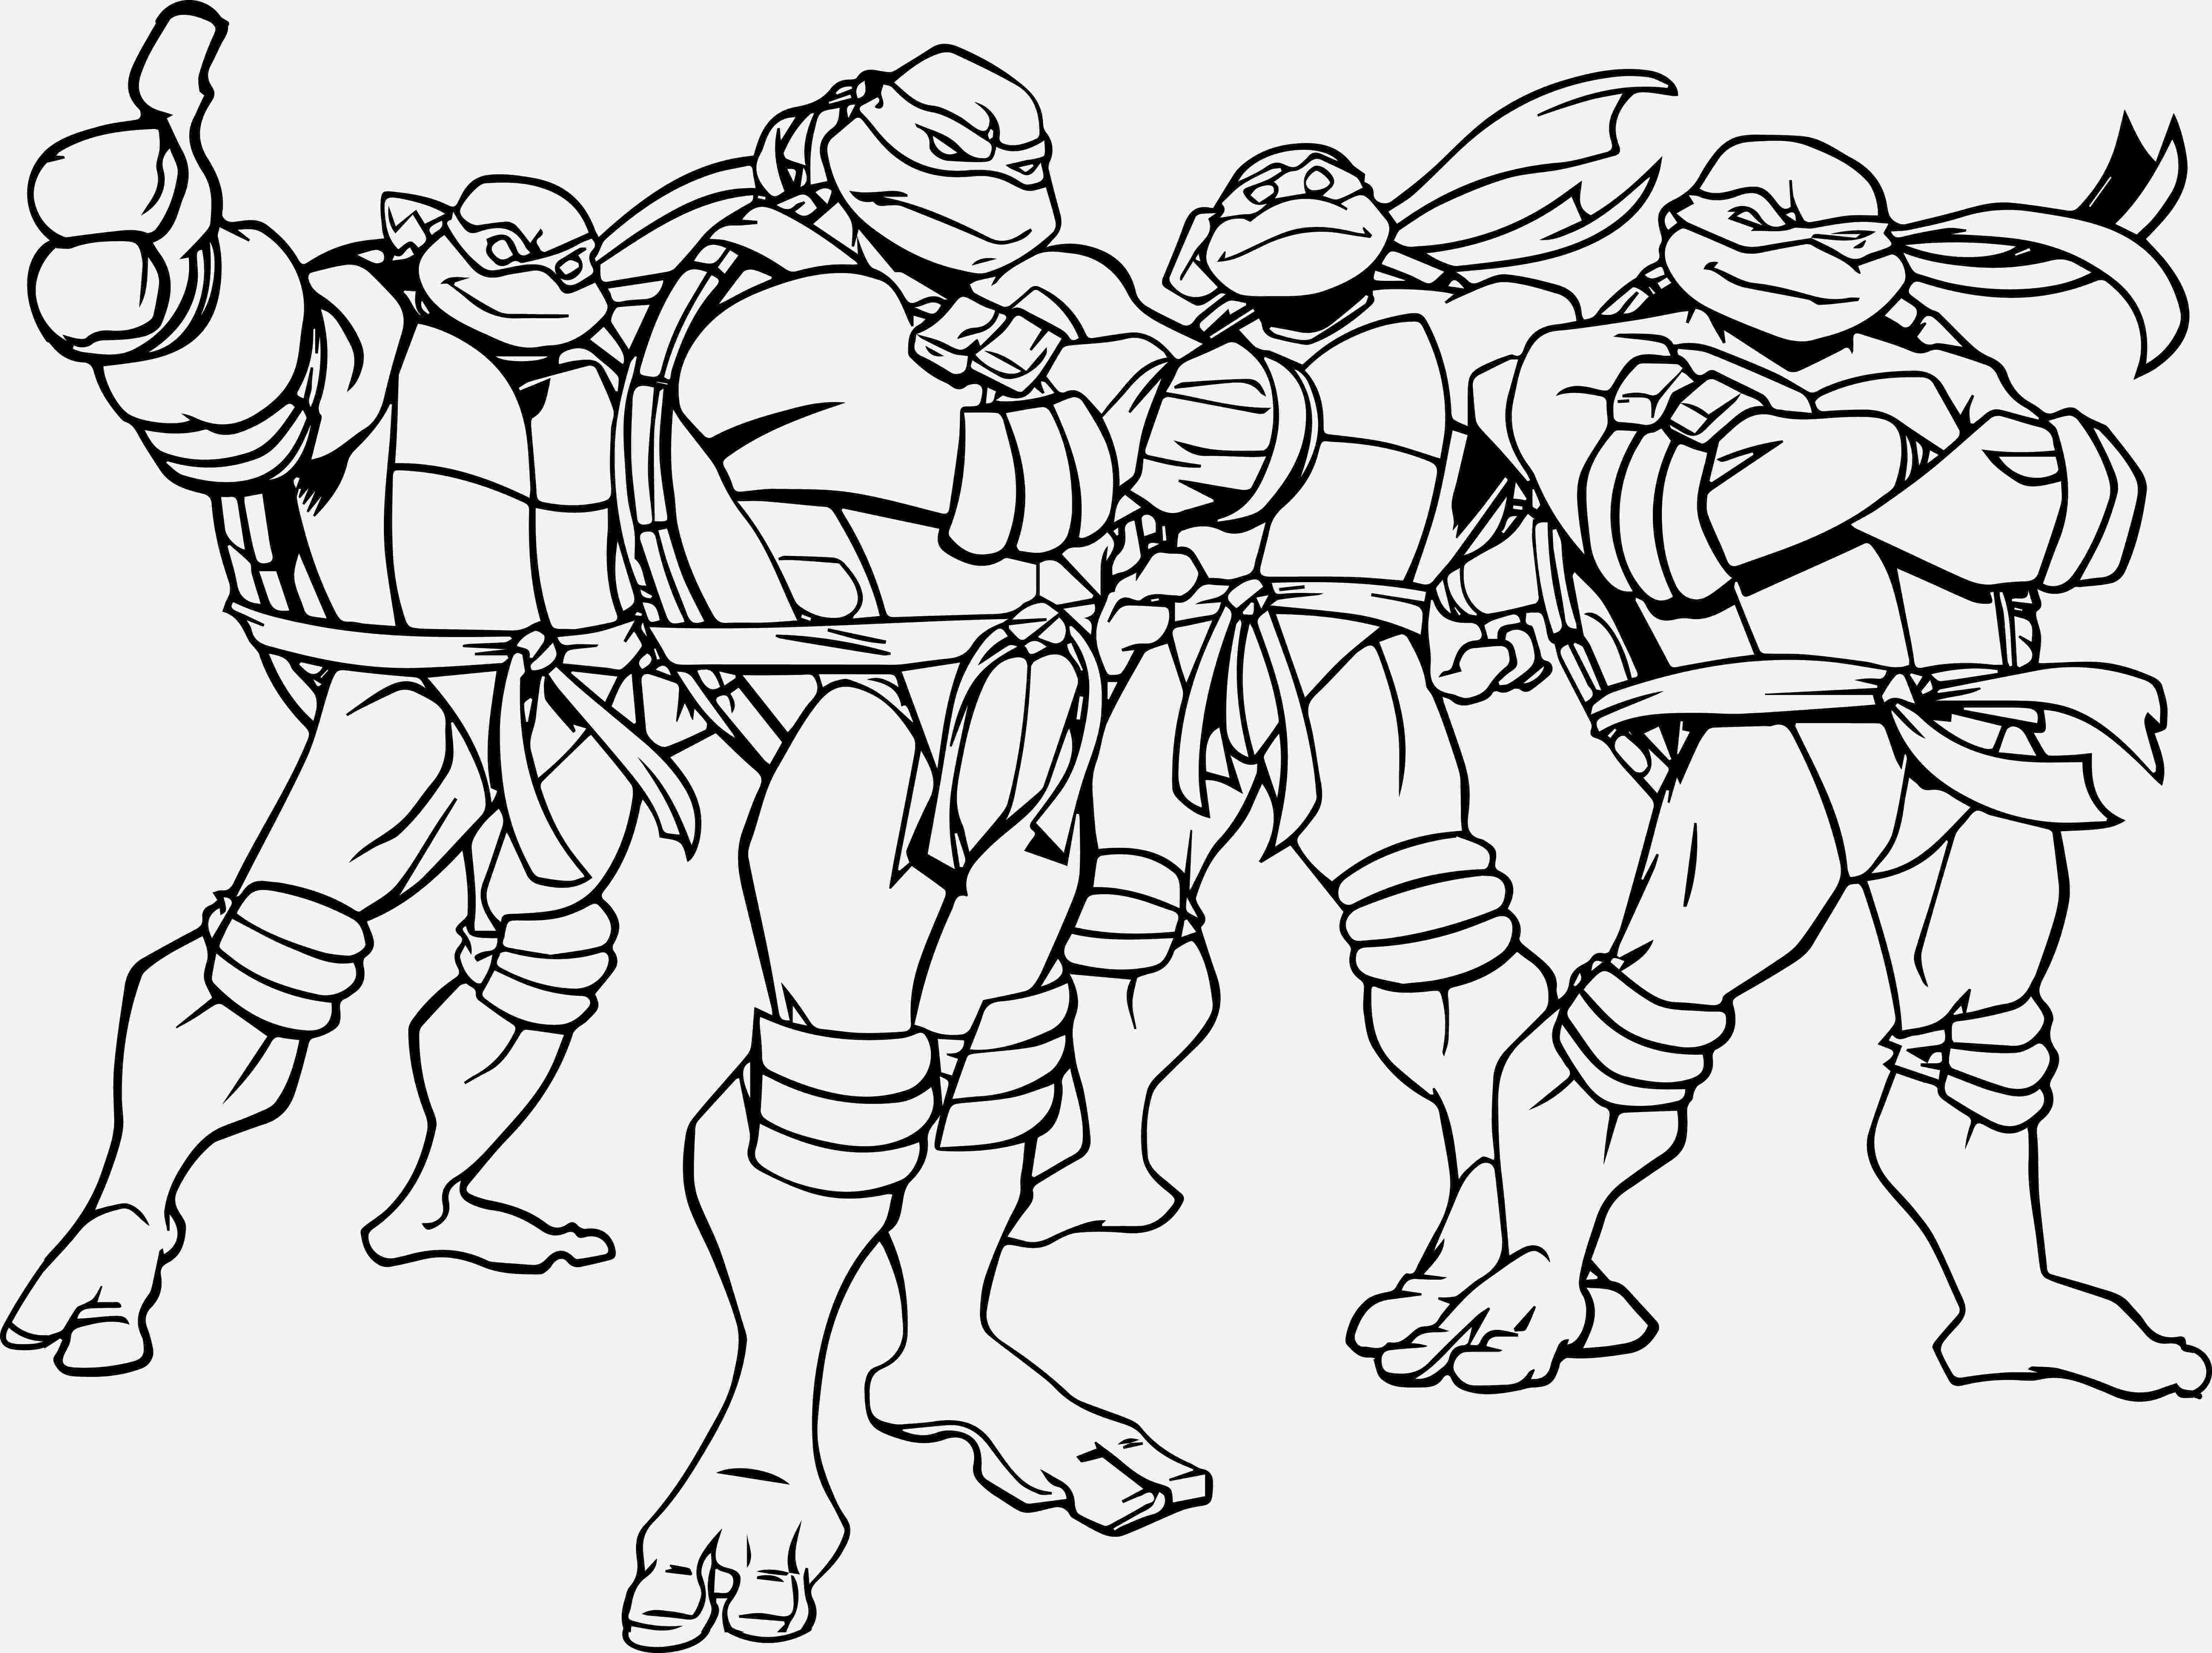 teenage mutant ninja turtles coloring sheet teenage mutant ninja turtles coloring pages turtles teenage coloring ninja sheet mutant